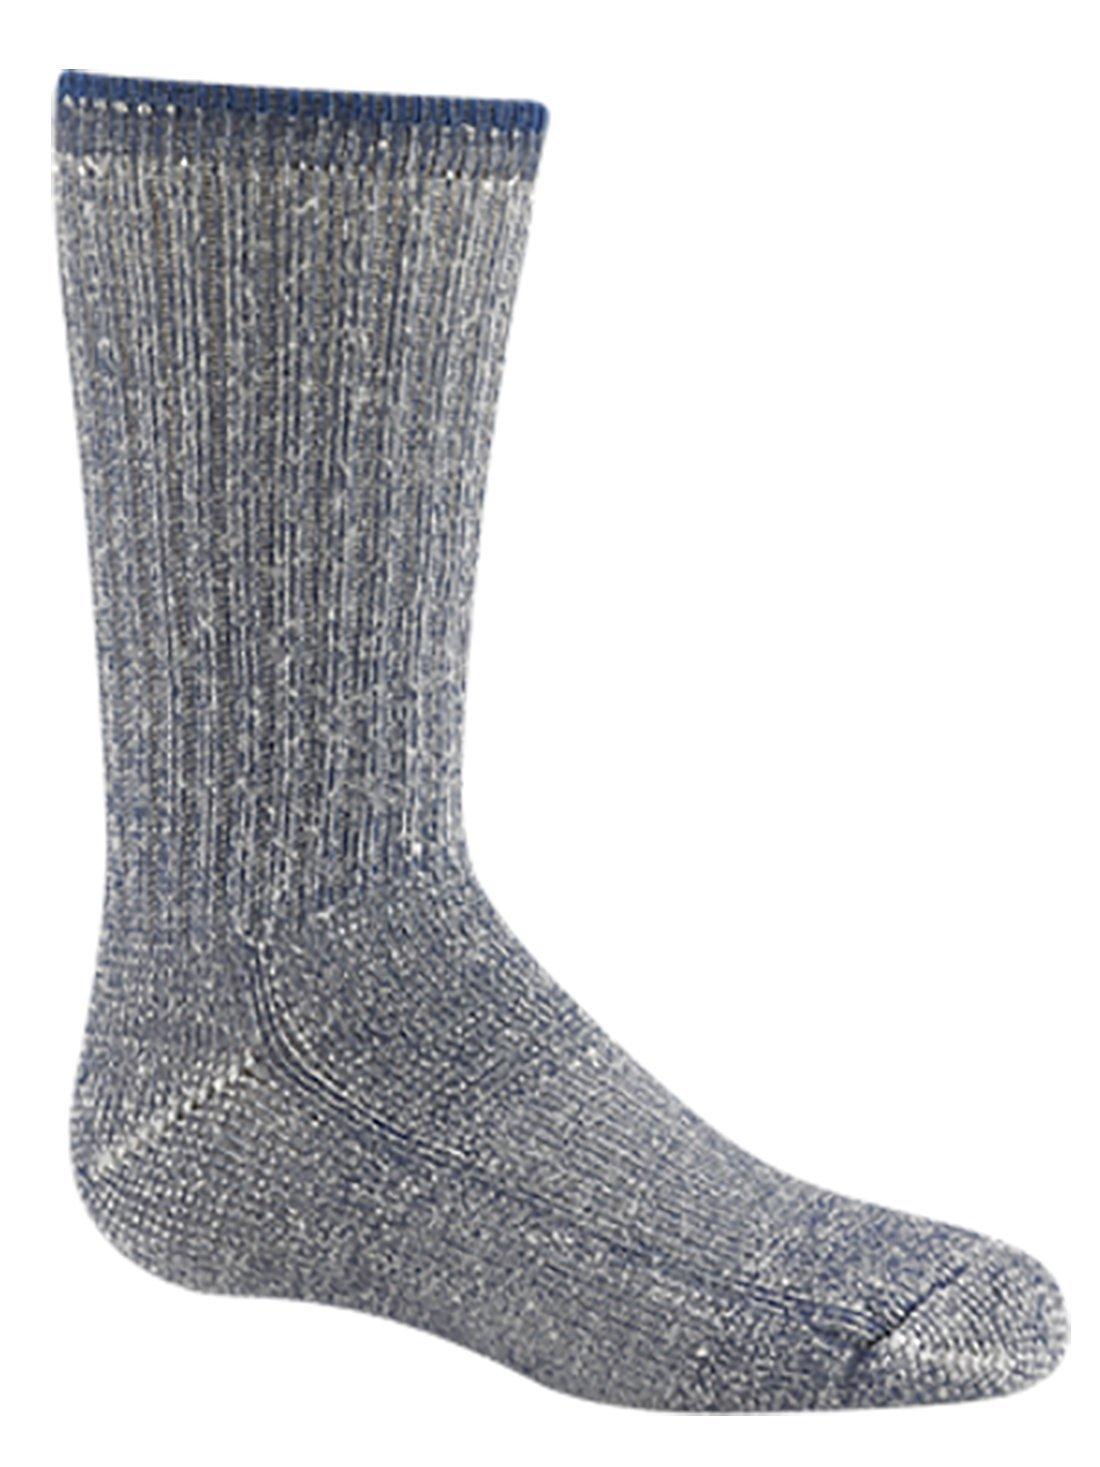 Wigwam Kid's Merino Wool Comfort Hiker Socks,Toddler 4-7 with a Helicase brand sock ring